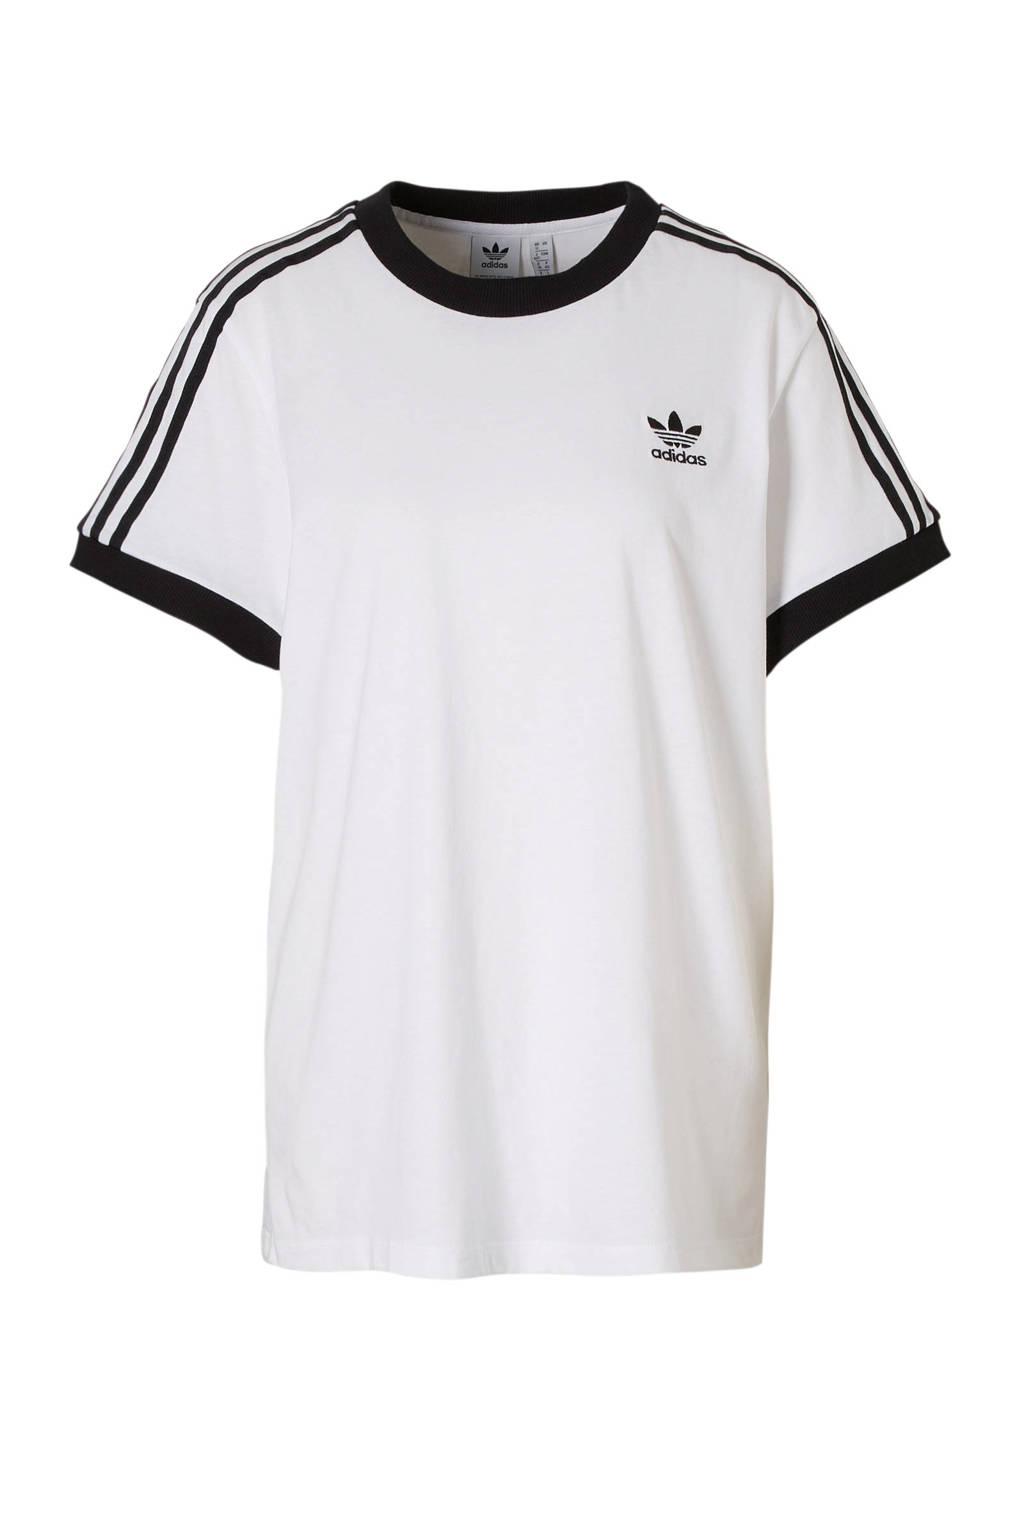 adidas originals T-shirt wit/zwart, Wit/zwart